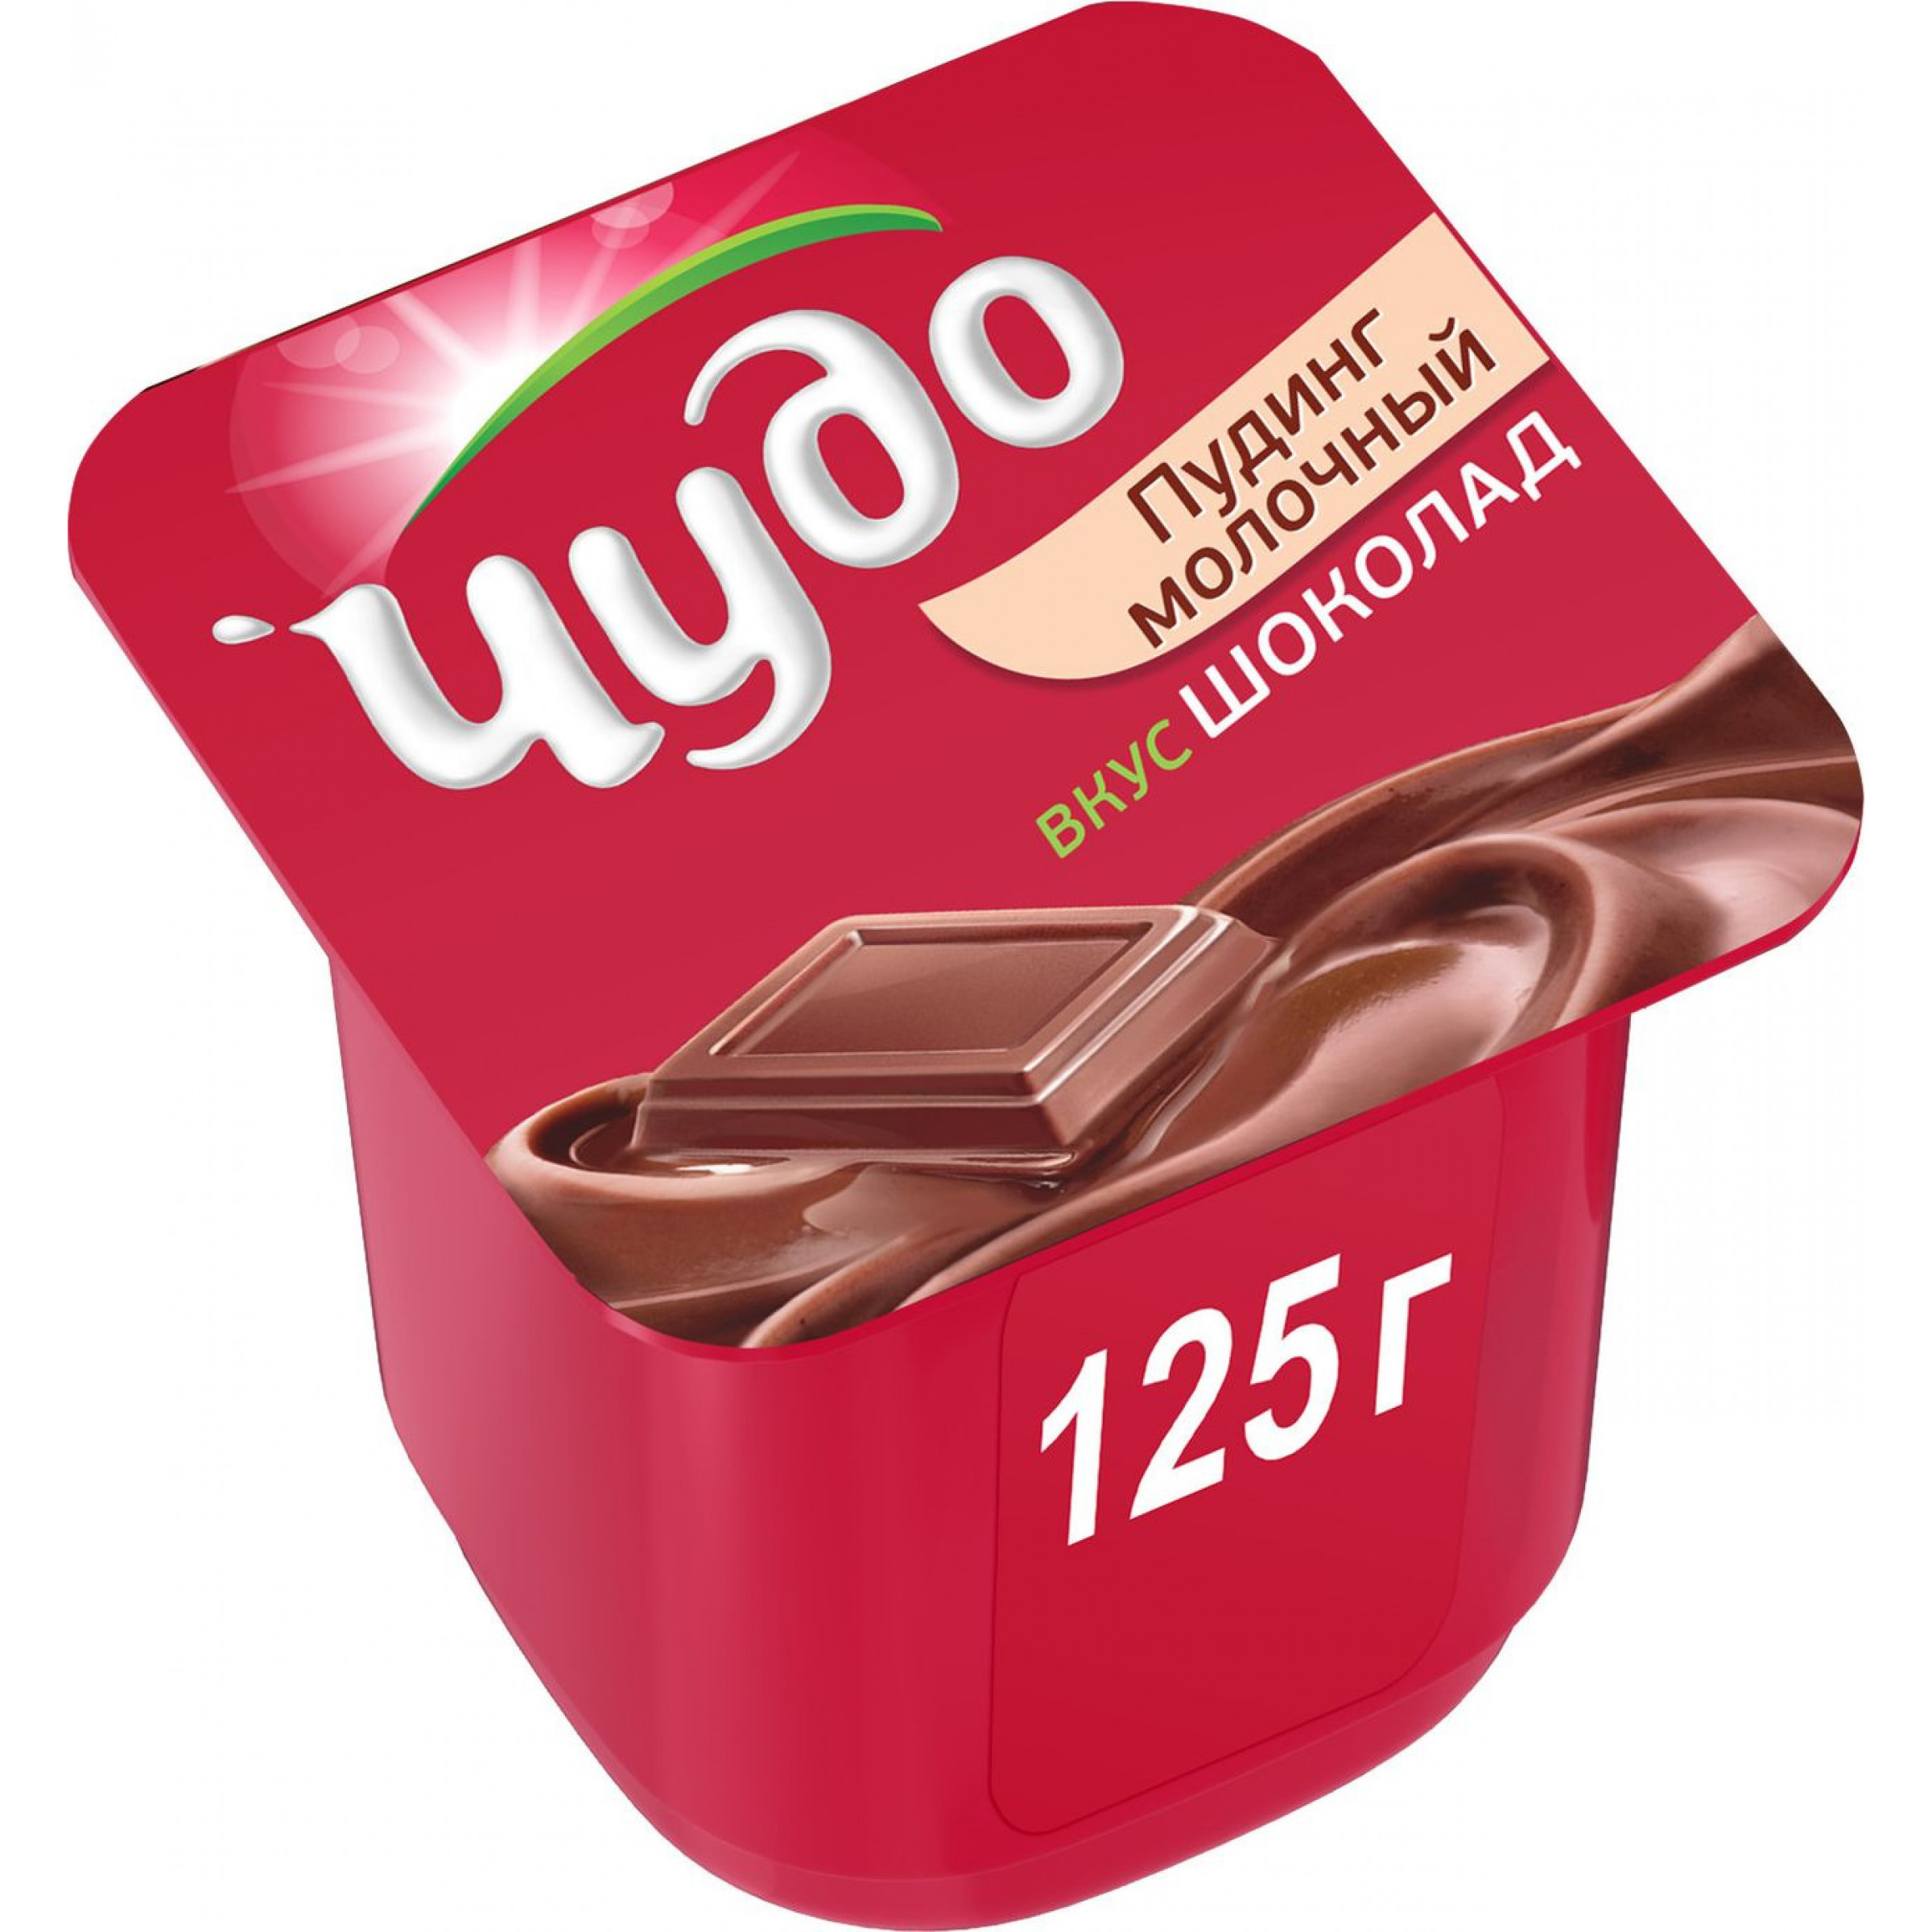 "Пудинг ""Чудо"" 3% шоколадный, 125г."